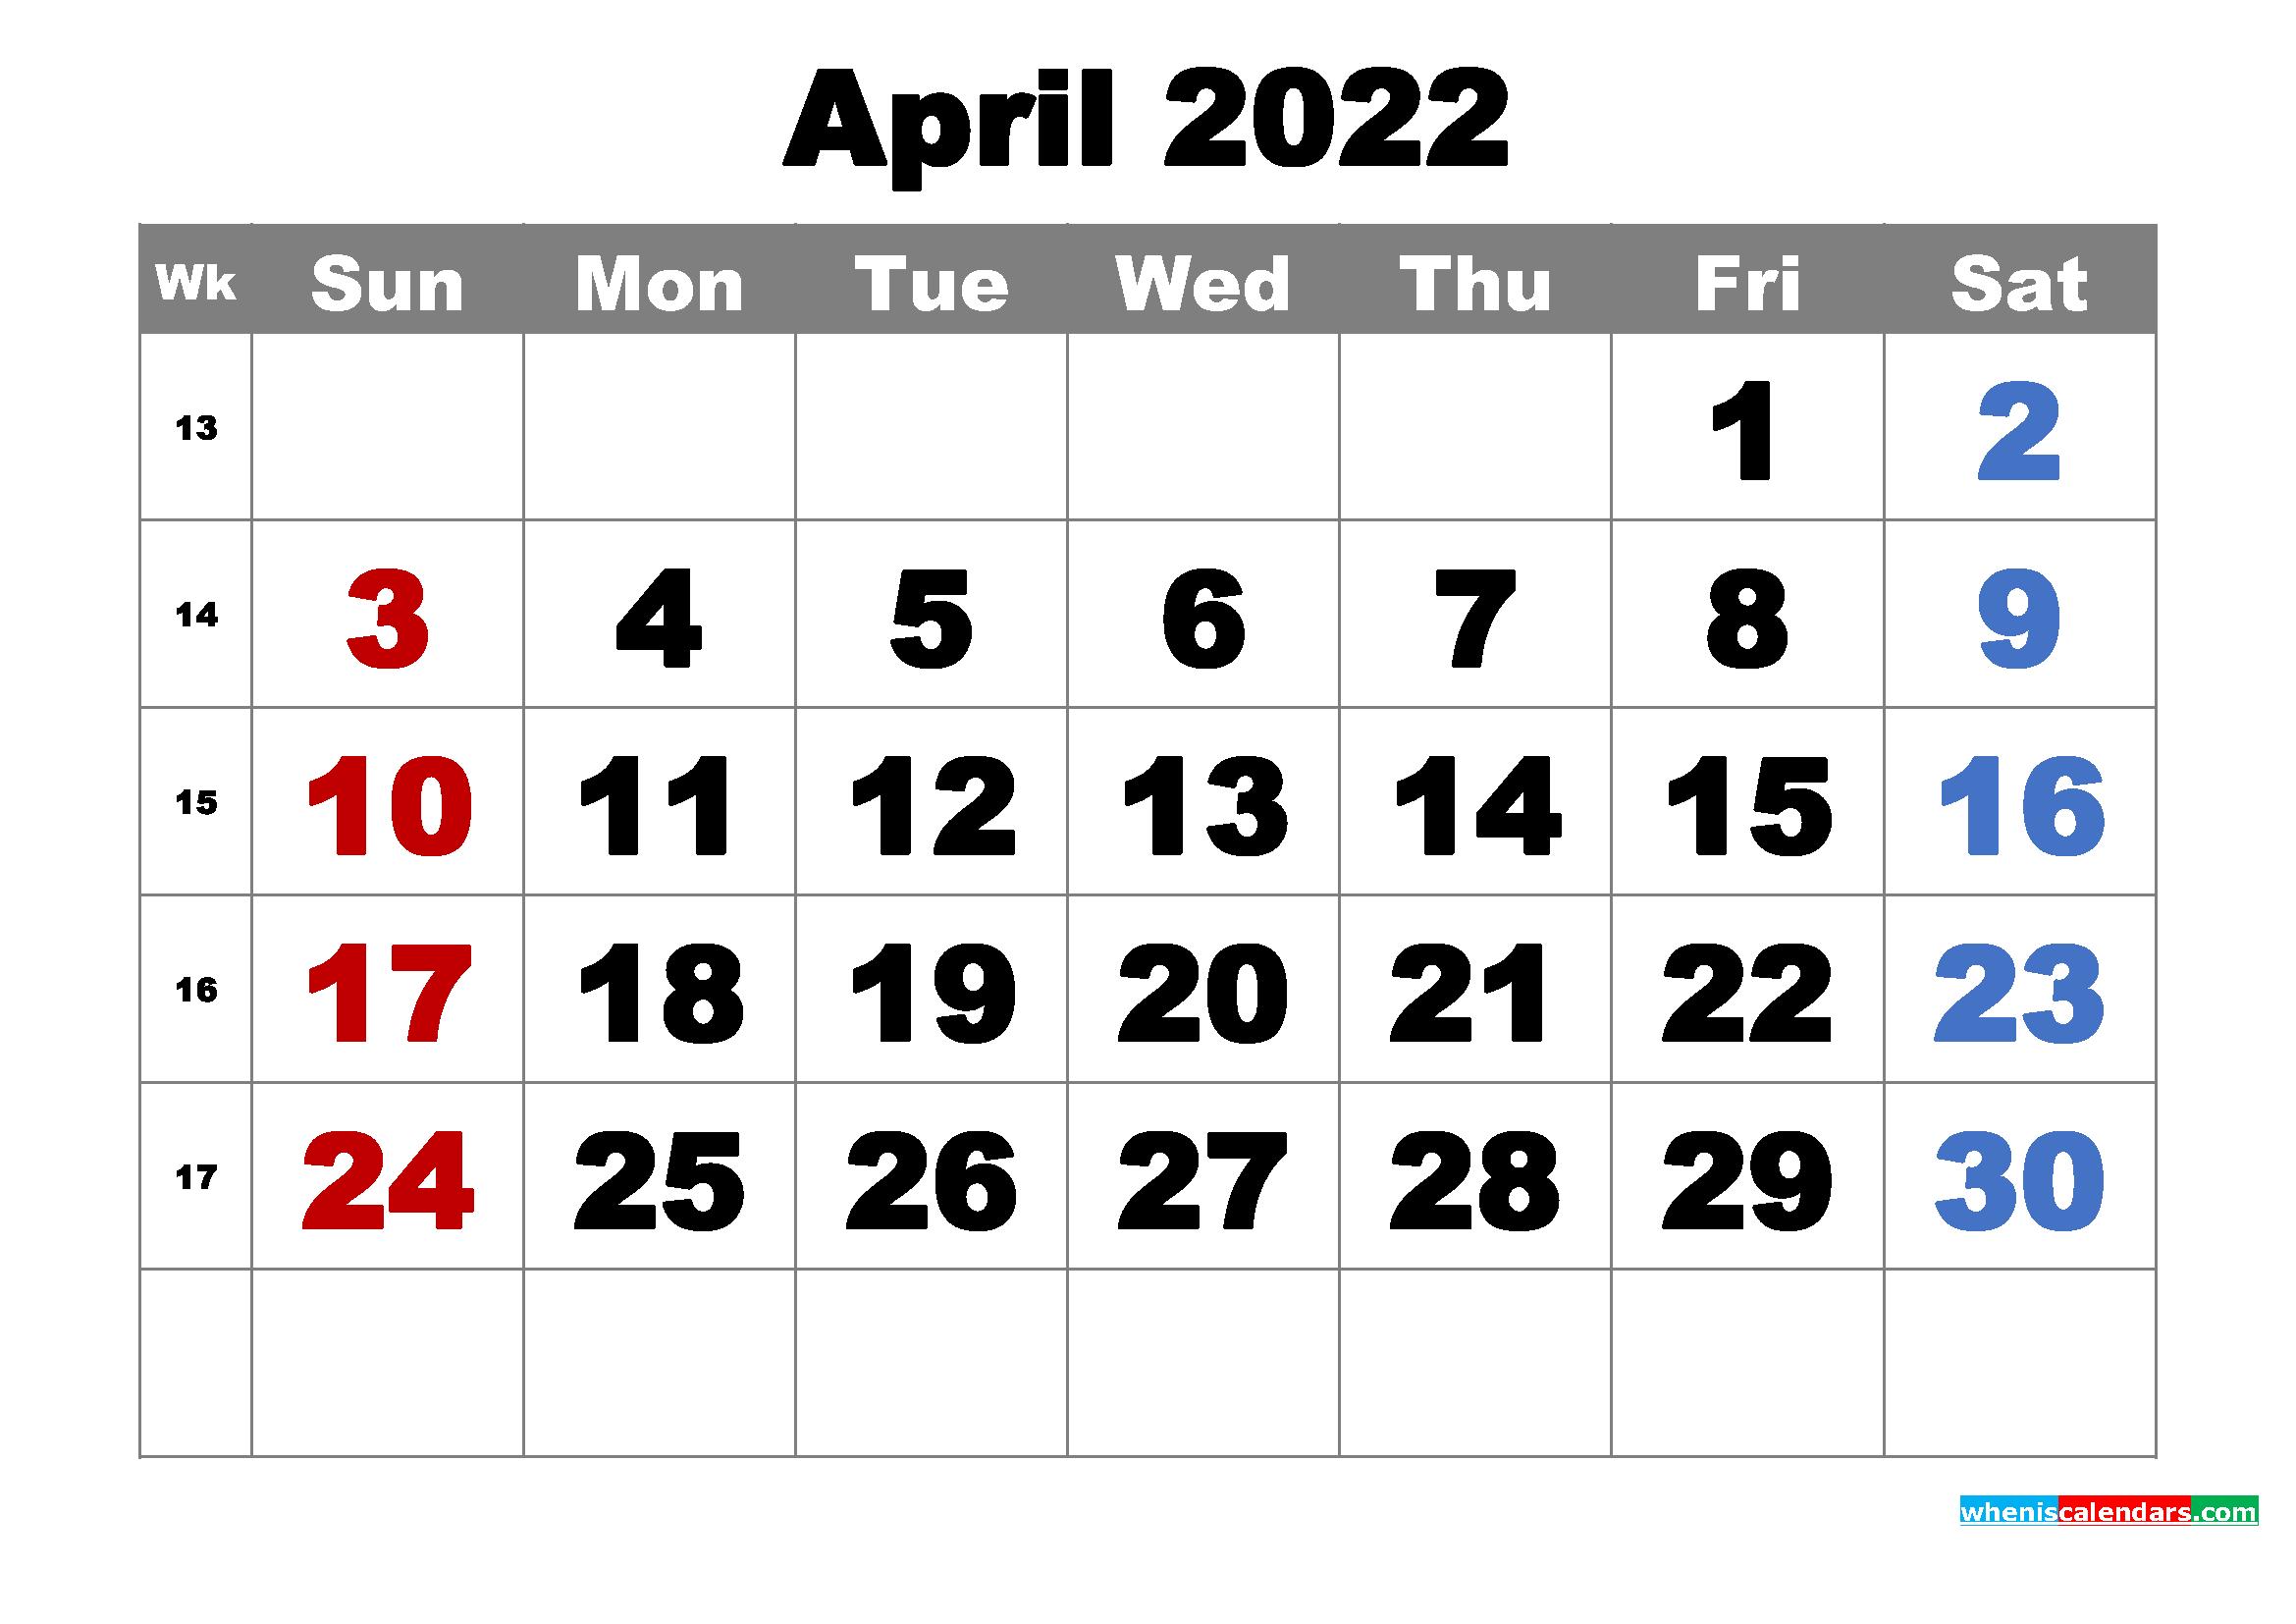 Free Printable April 2022 Calendar Word, PDF, Image - Free ...